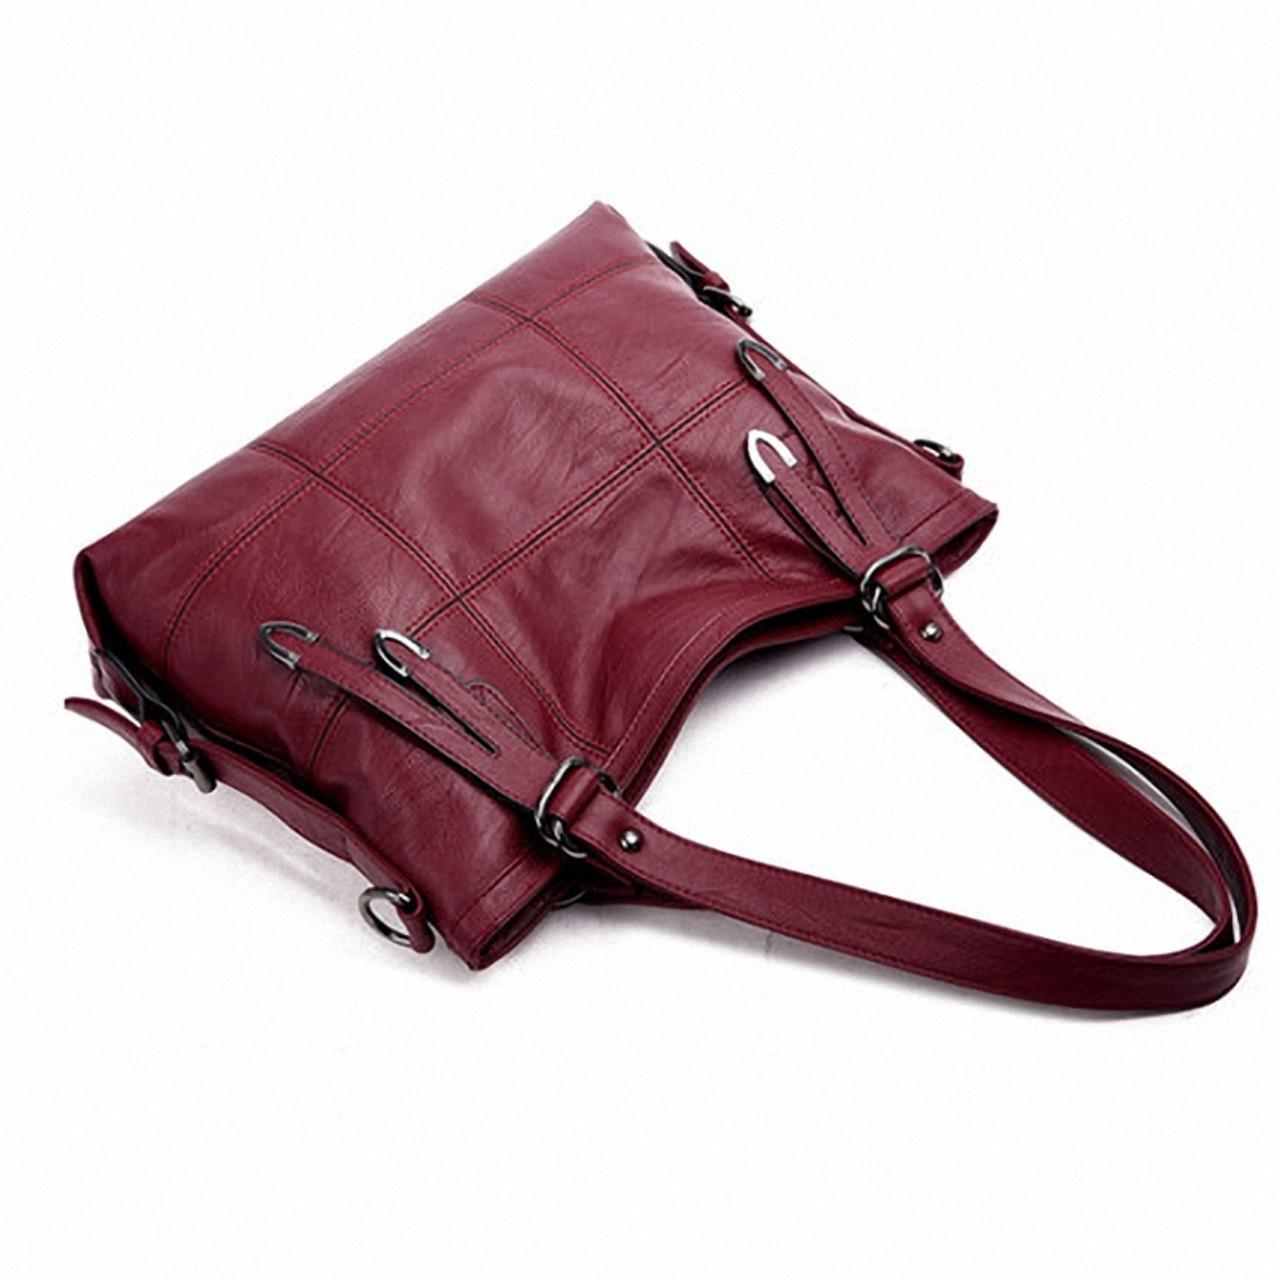 b811b9277d ... YASICAIDI Patchwork Women Shoulder Bag High Quality Black Pu Leather  Women Handbag Vintage Stitching Large Crossbody ...